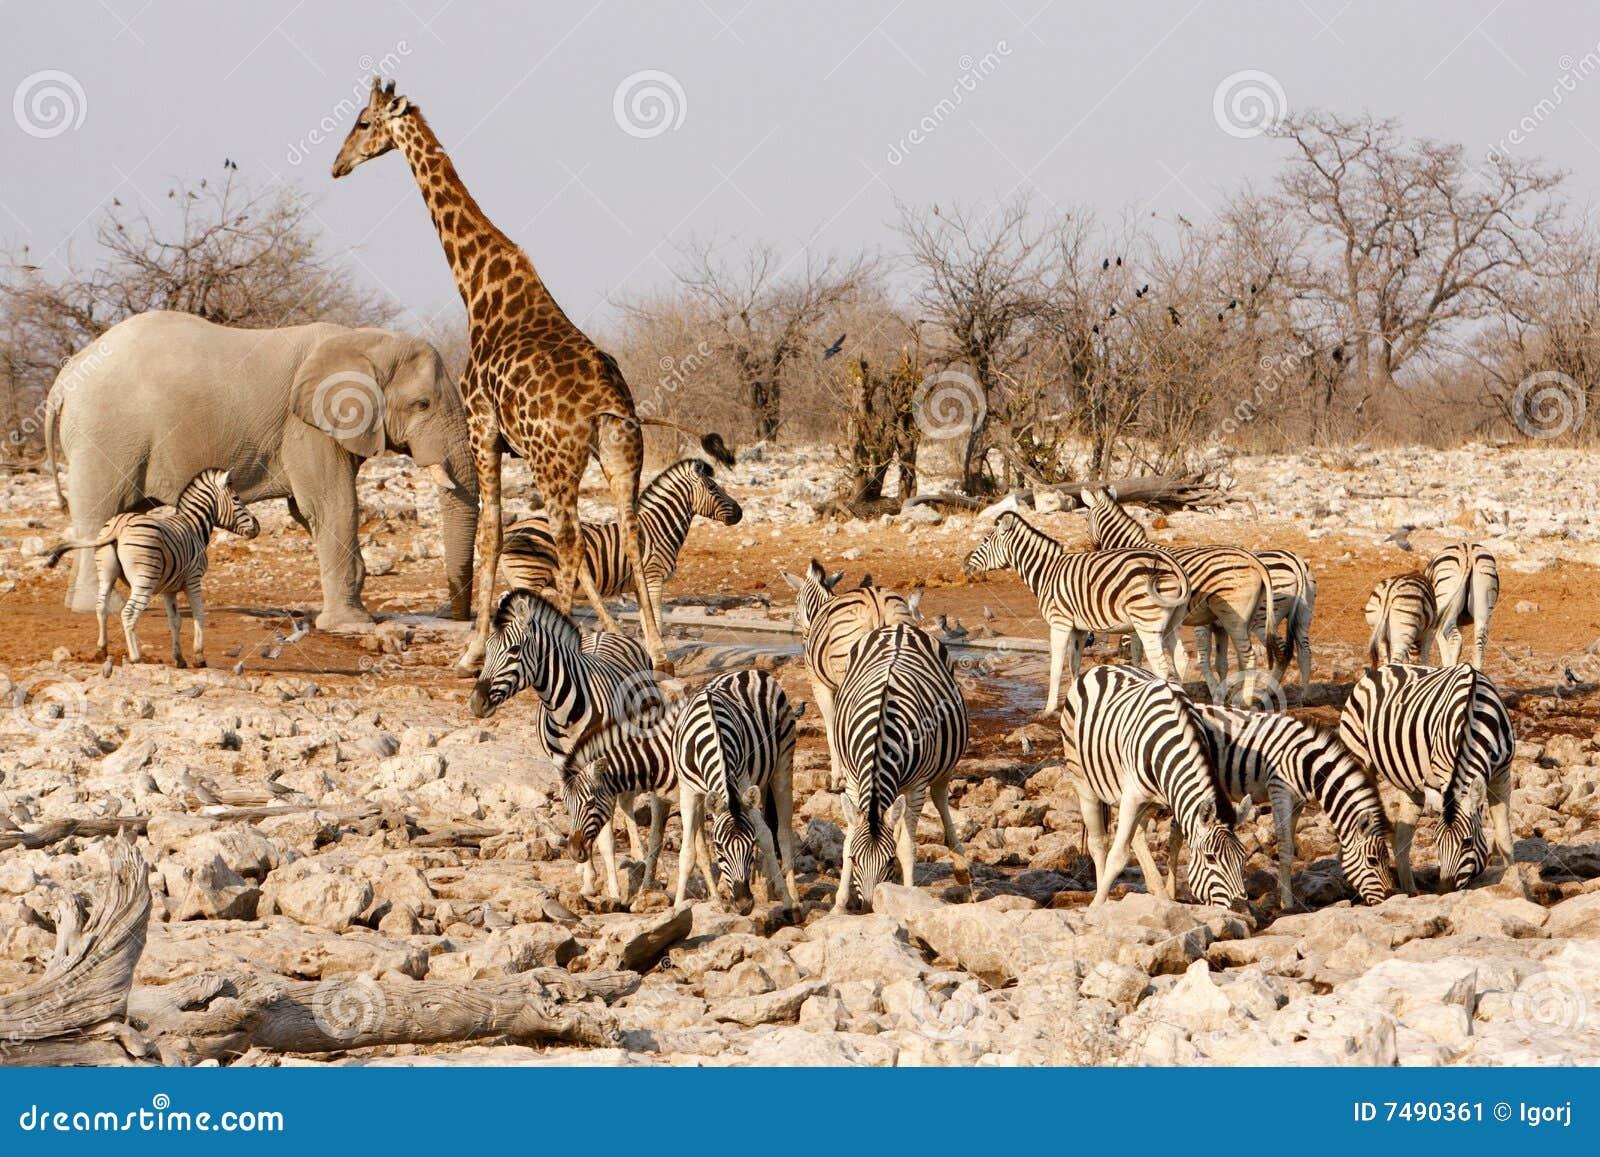 Animals Around A Water Hole Stock Image Image 7490361